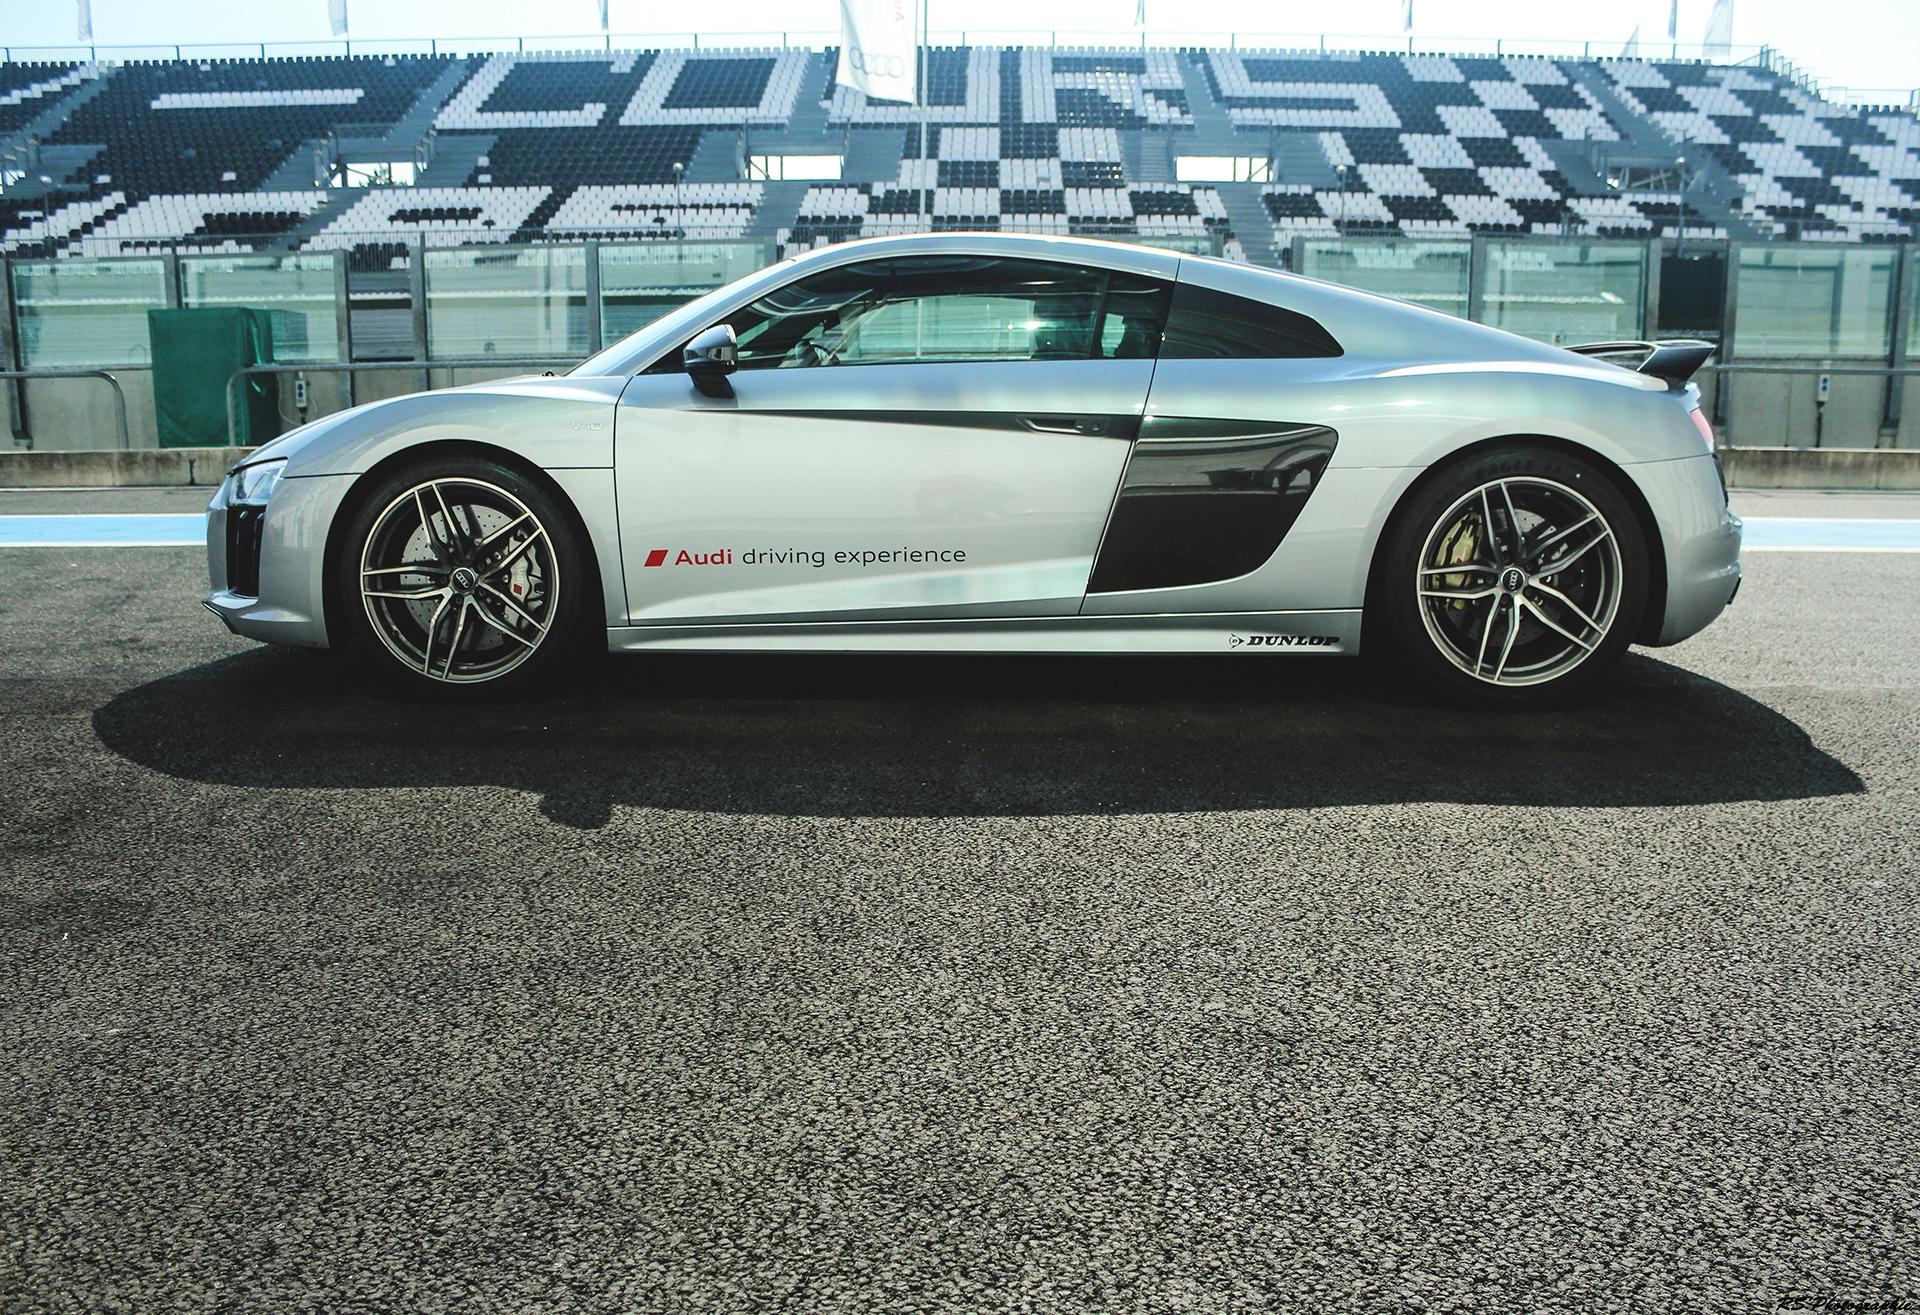 Audi R8 V10 Plus - profil / side-face - photo Arnaud Demasier